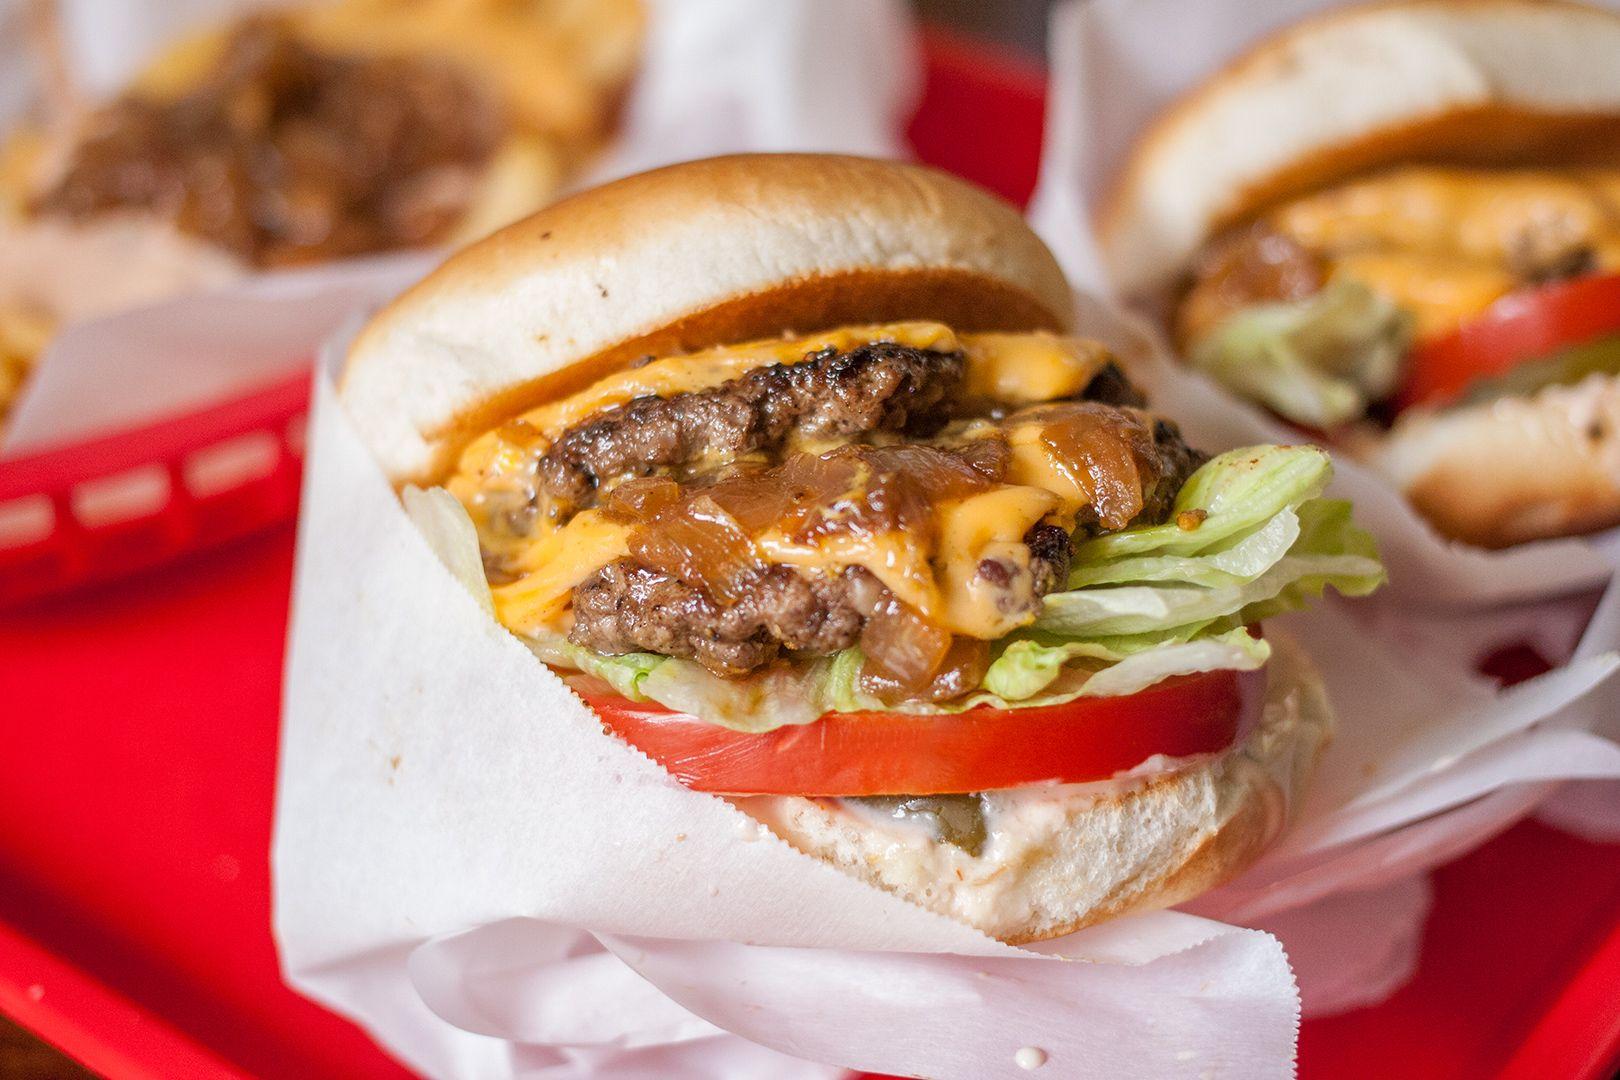 Blue apron halal - The 25 Best Ideas About Halal Burgers On Pinterest United Arab Emirates Halal Recipes And Dubai Travel